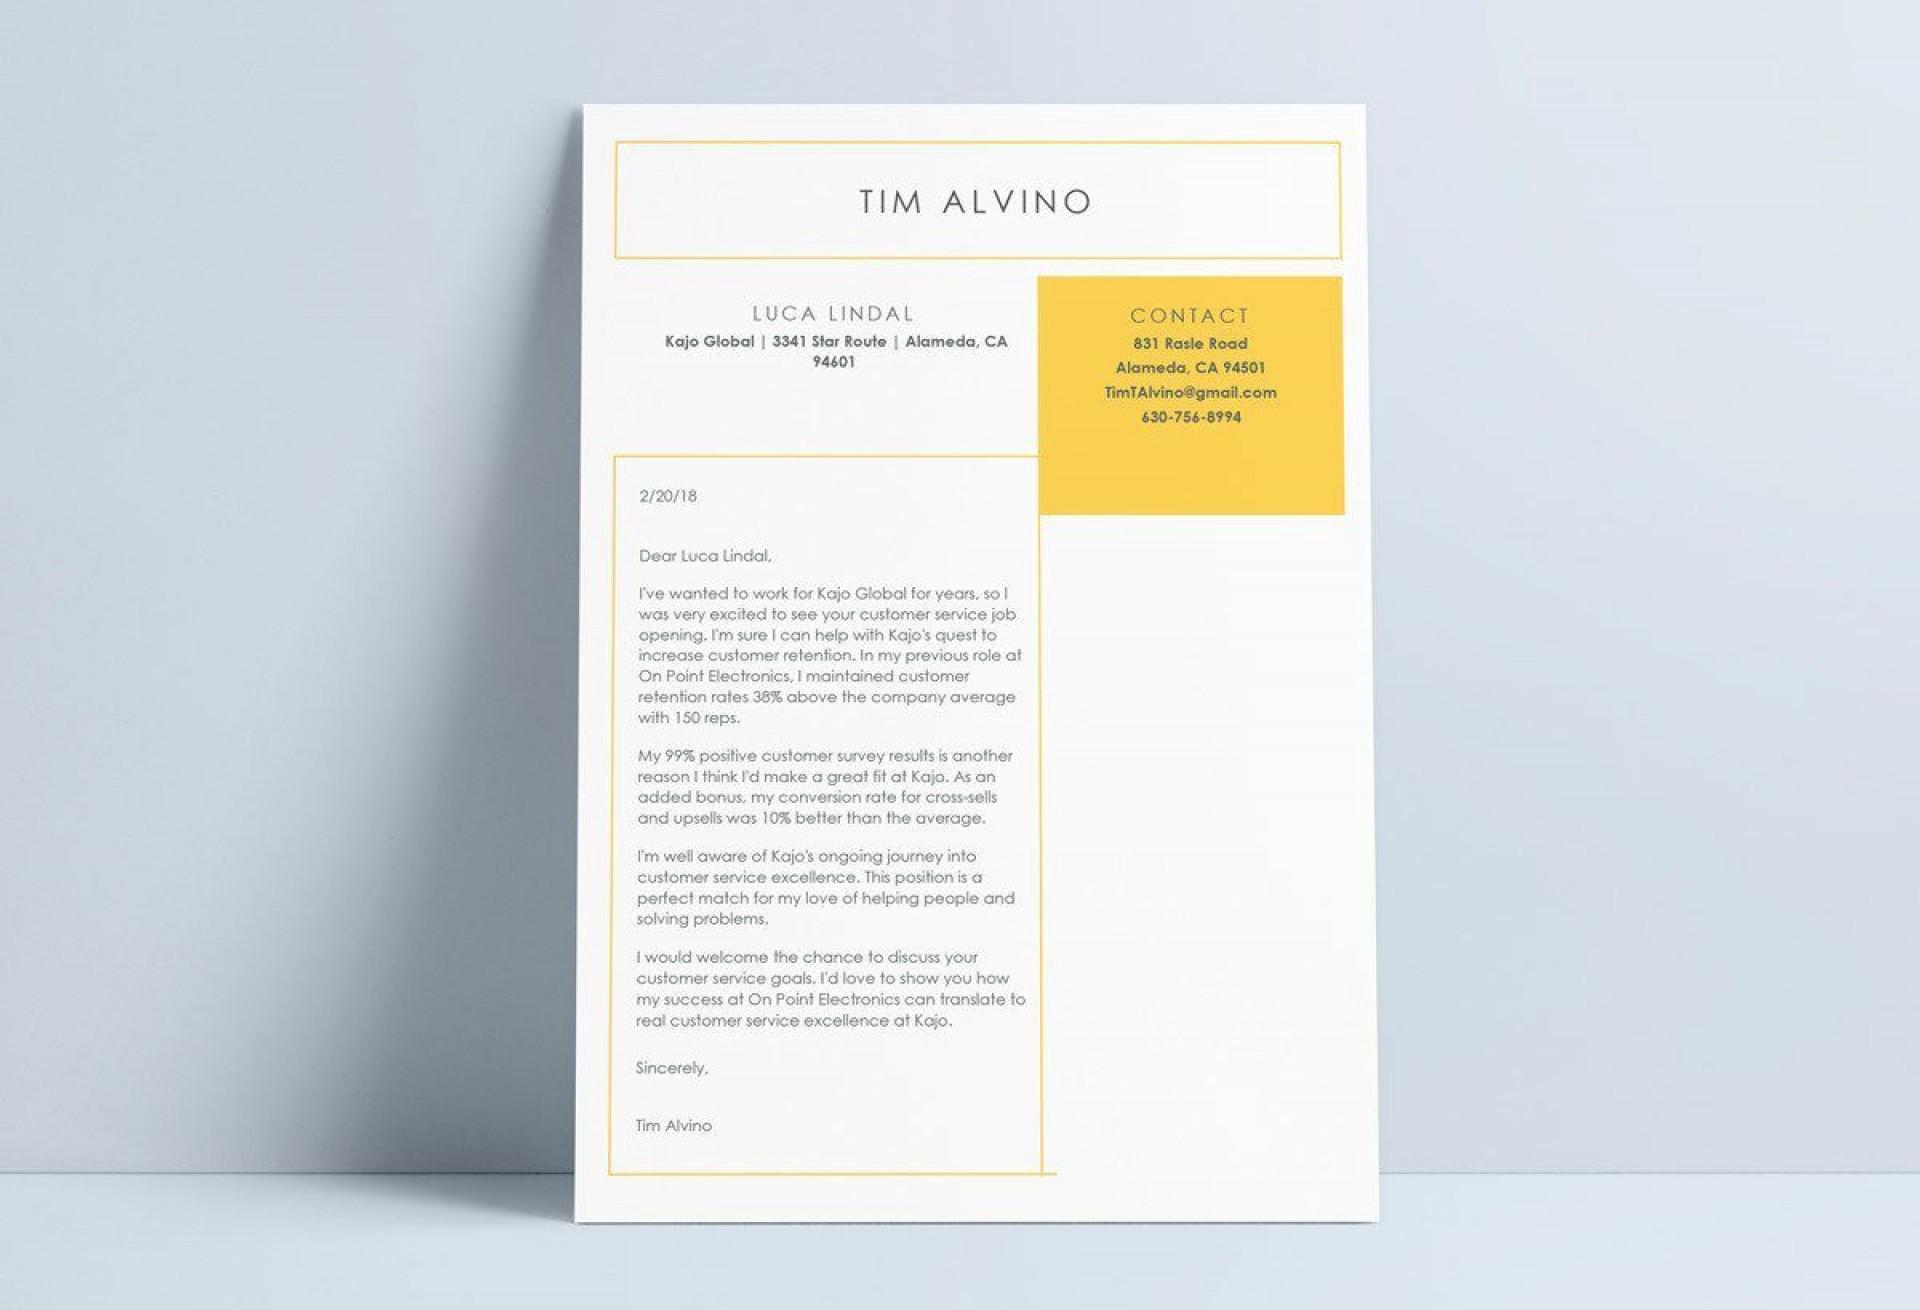 004 Singular Cover Letter Template Office Online Highest Clarity  Microsoft1920